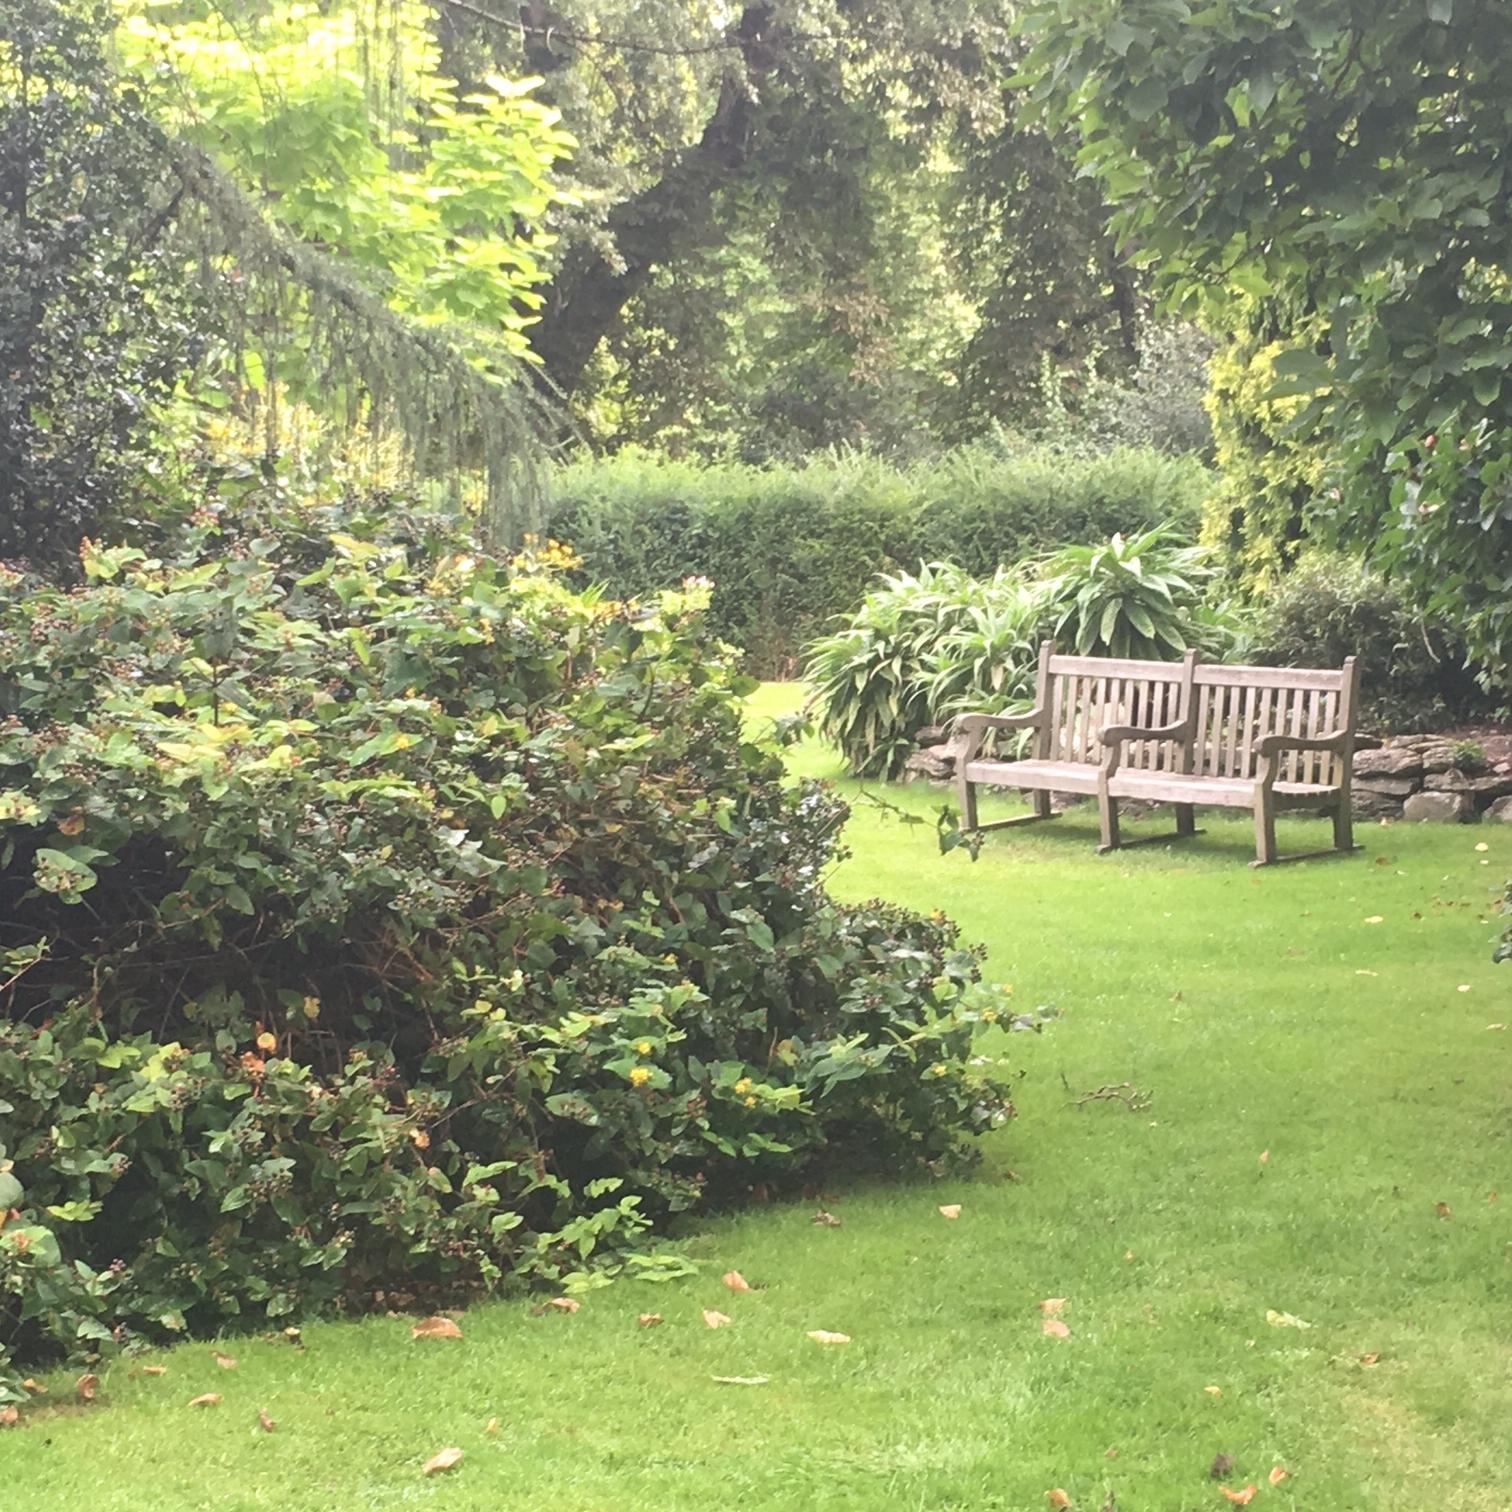 Kensington Garden, London by The Doubtful Traveller